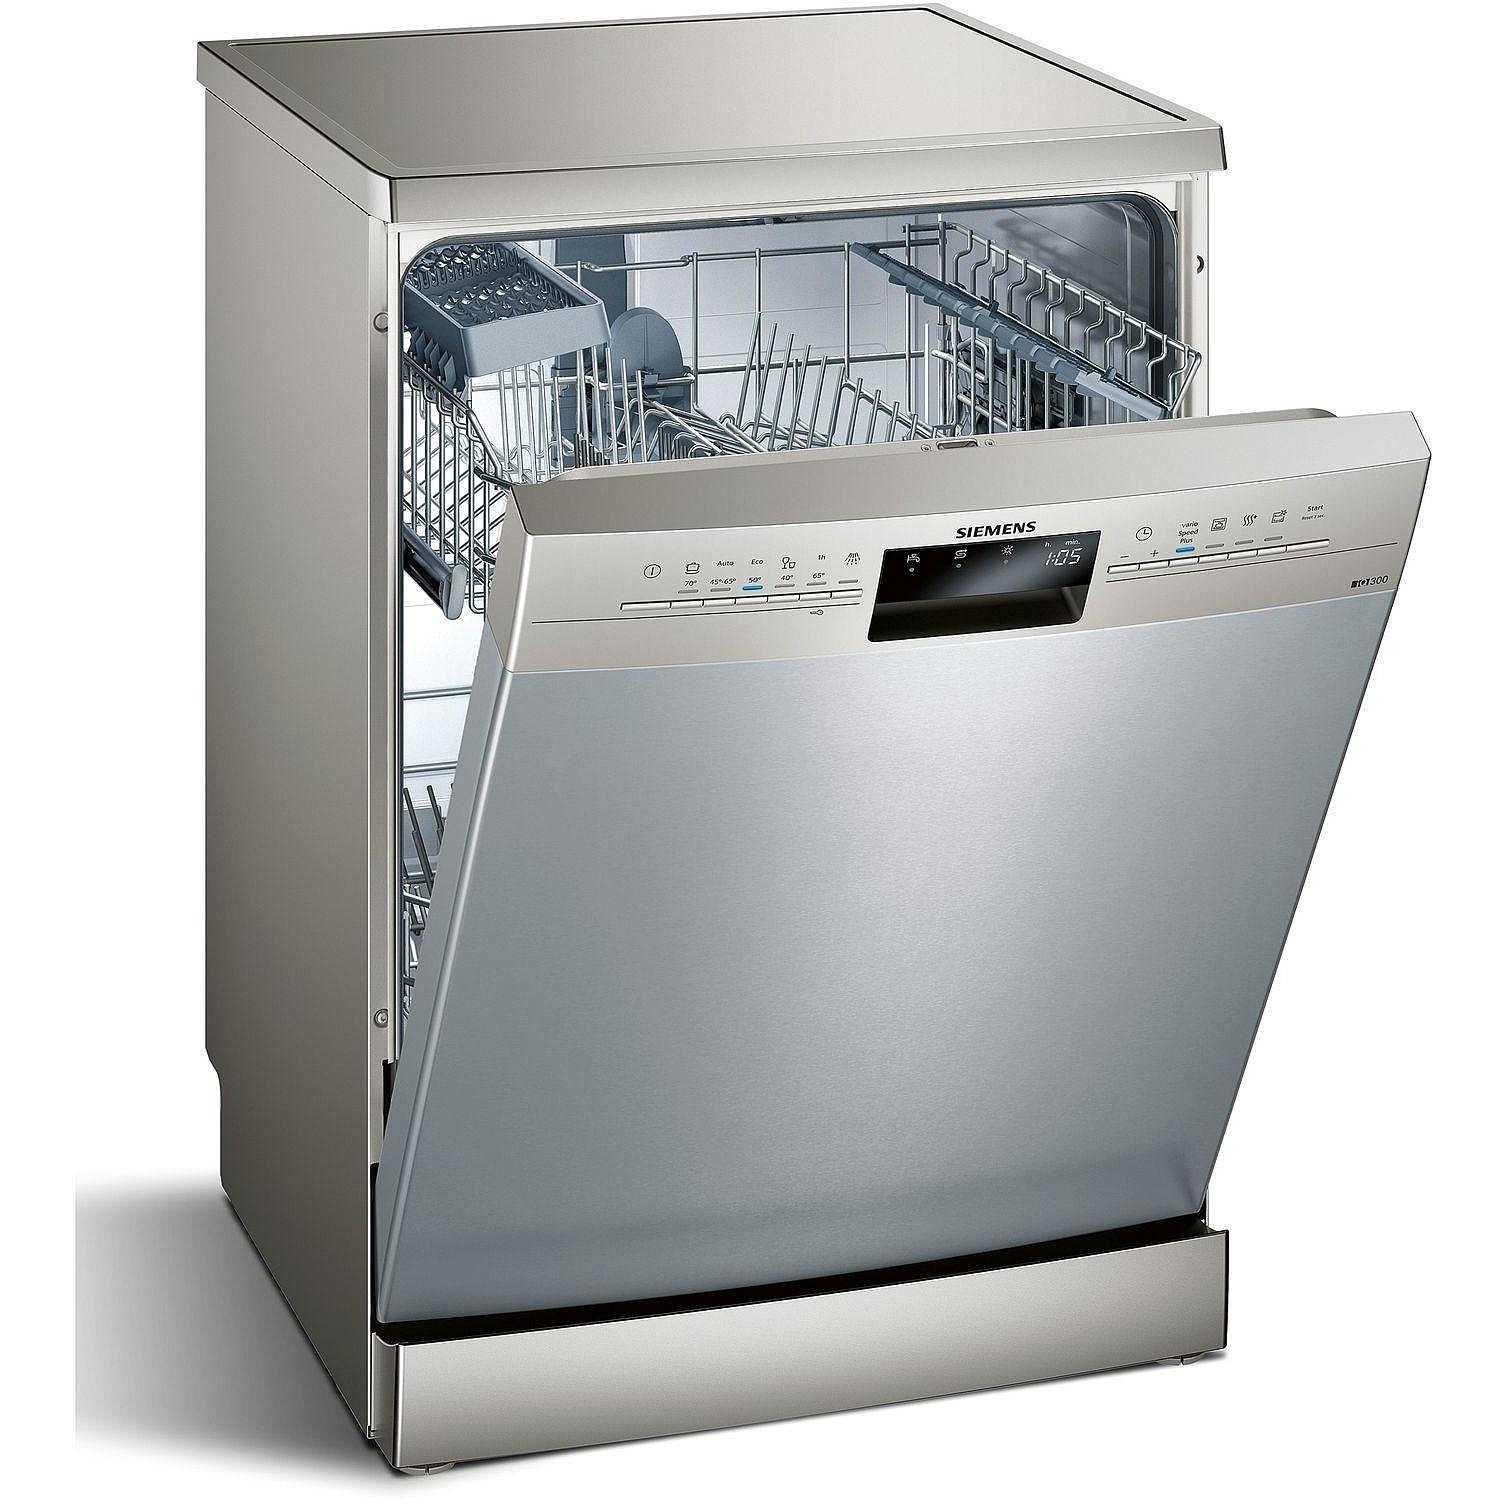 Siemens SN236I00IE iQ300 lavastoviglie 13 coperti 6 programmi classe ...